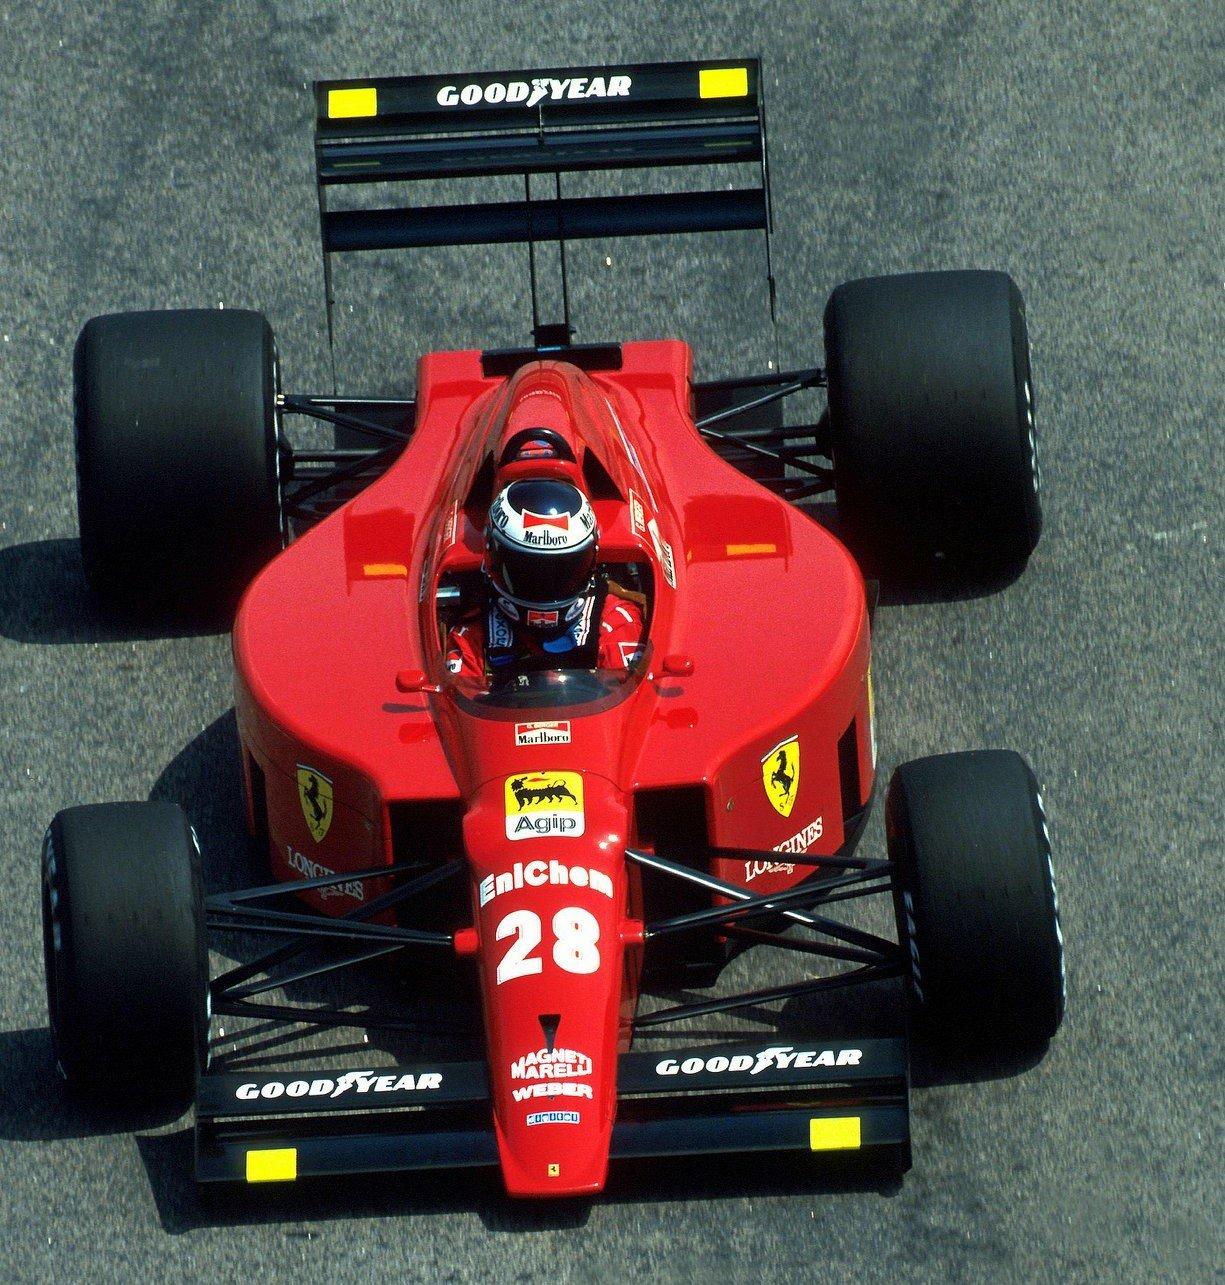 The simplicity and beauty of Adelaide Grand Prix-era Scuderia Ferrari cars. #F1 #Adelaide https://t.co/6zFYorNsmw